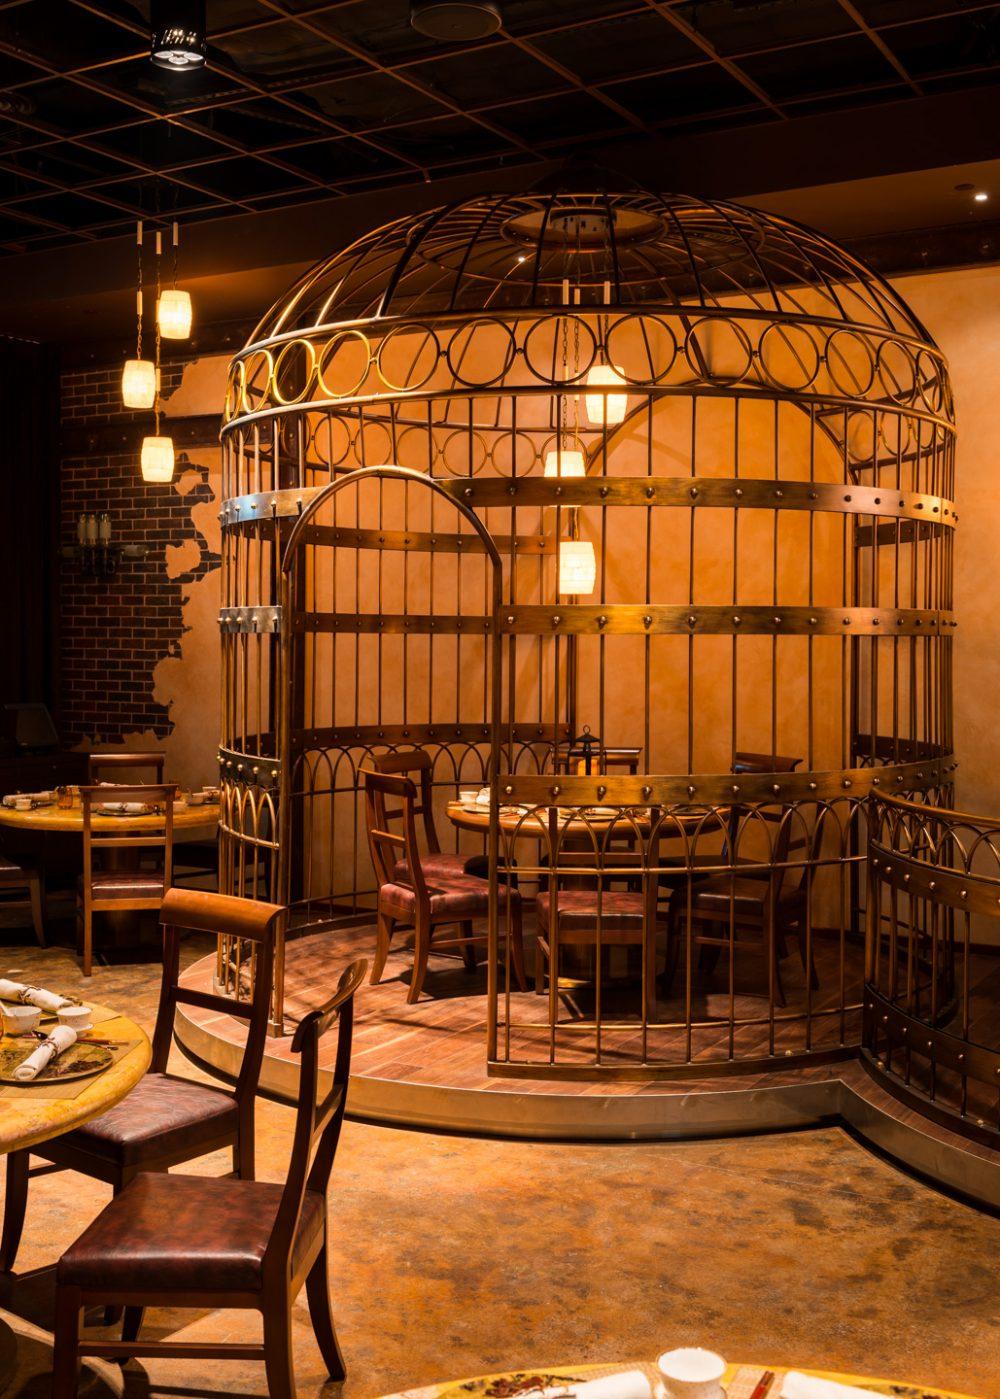 Shanghai Magic Birdcage